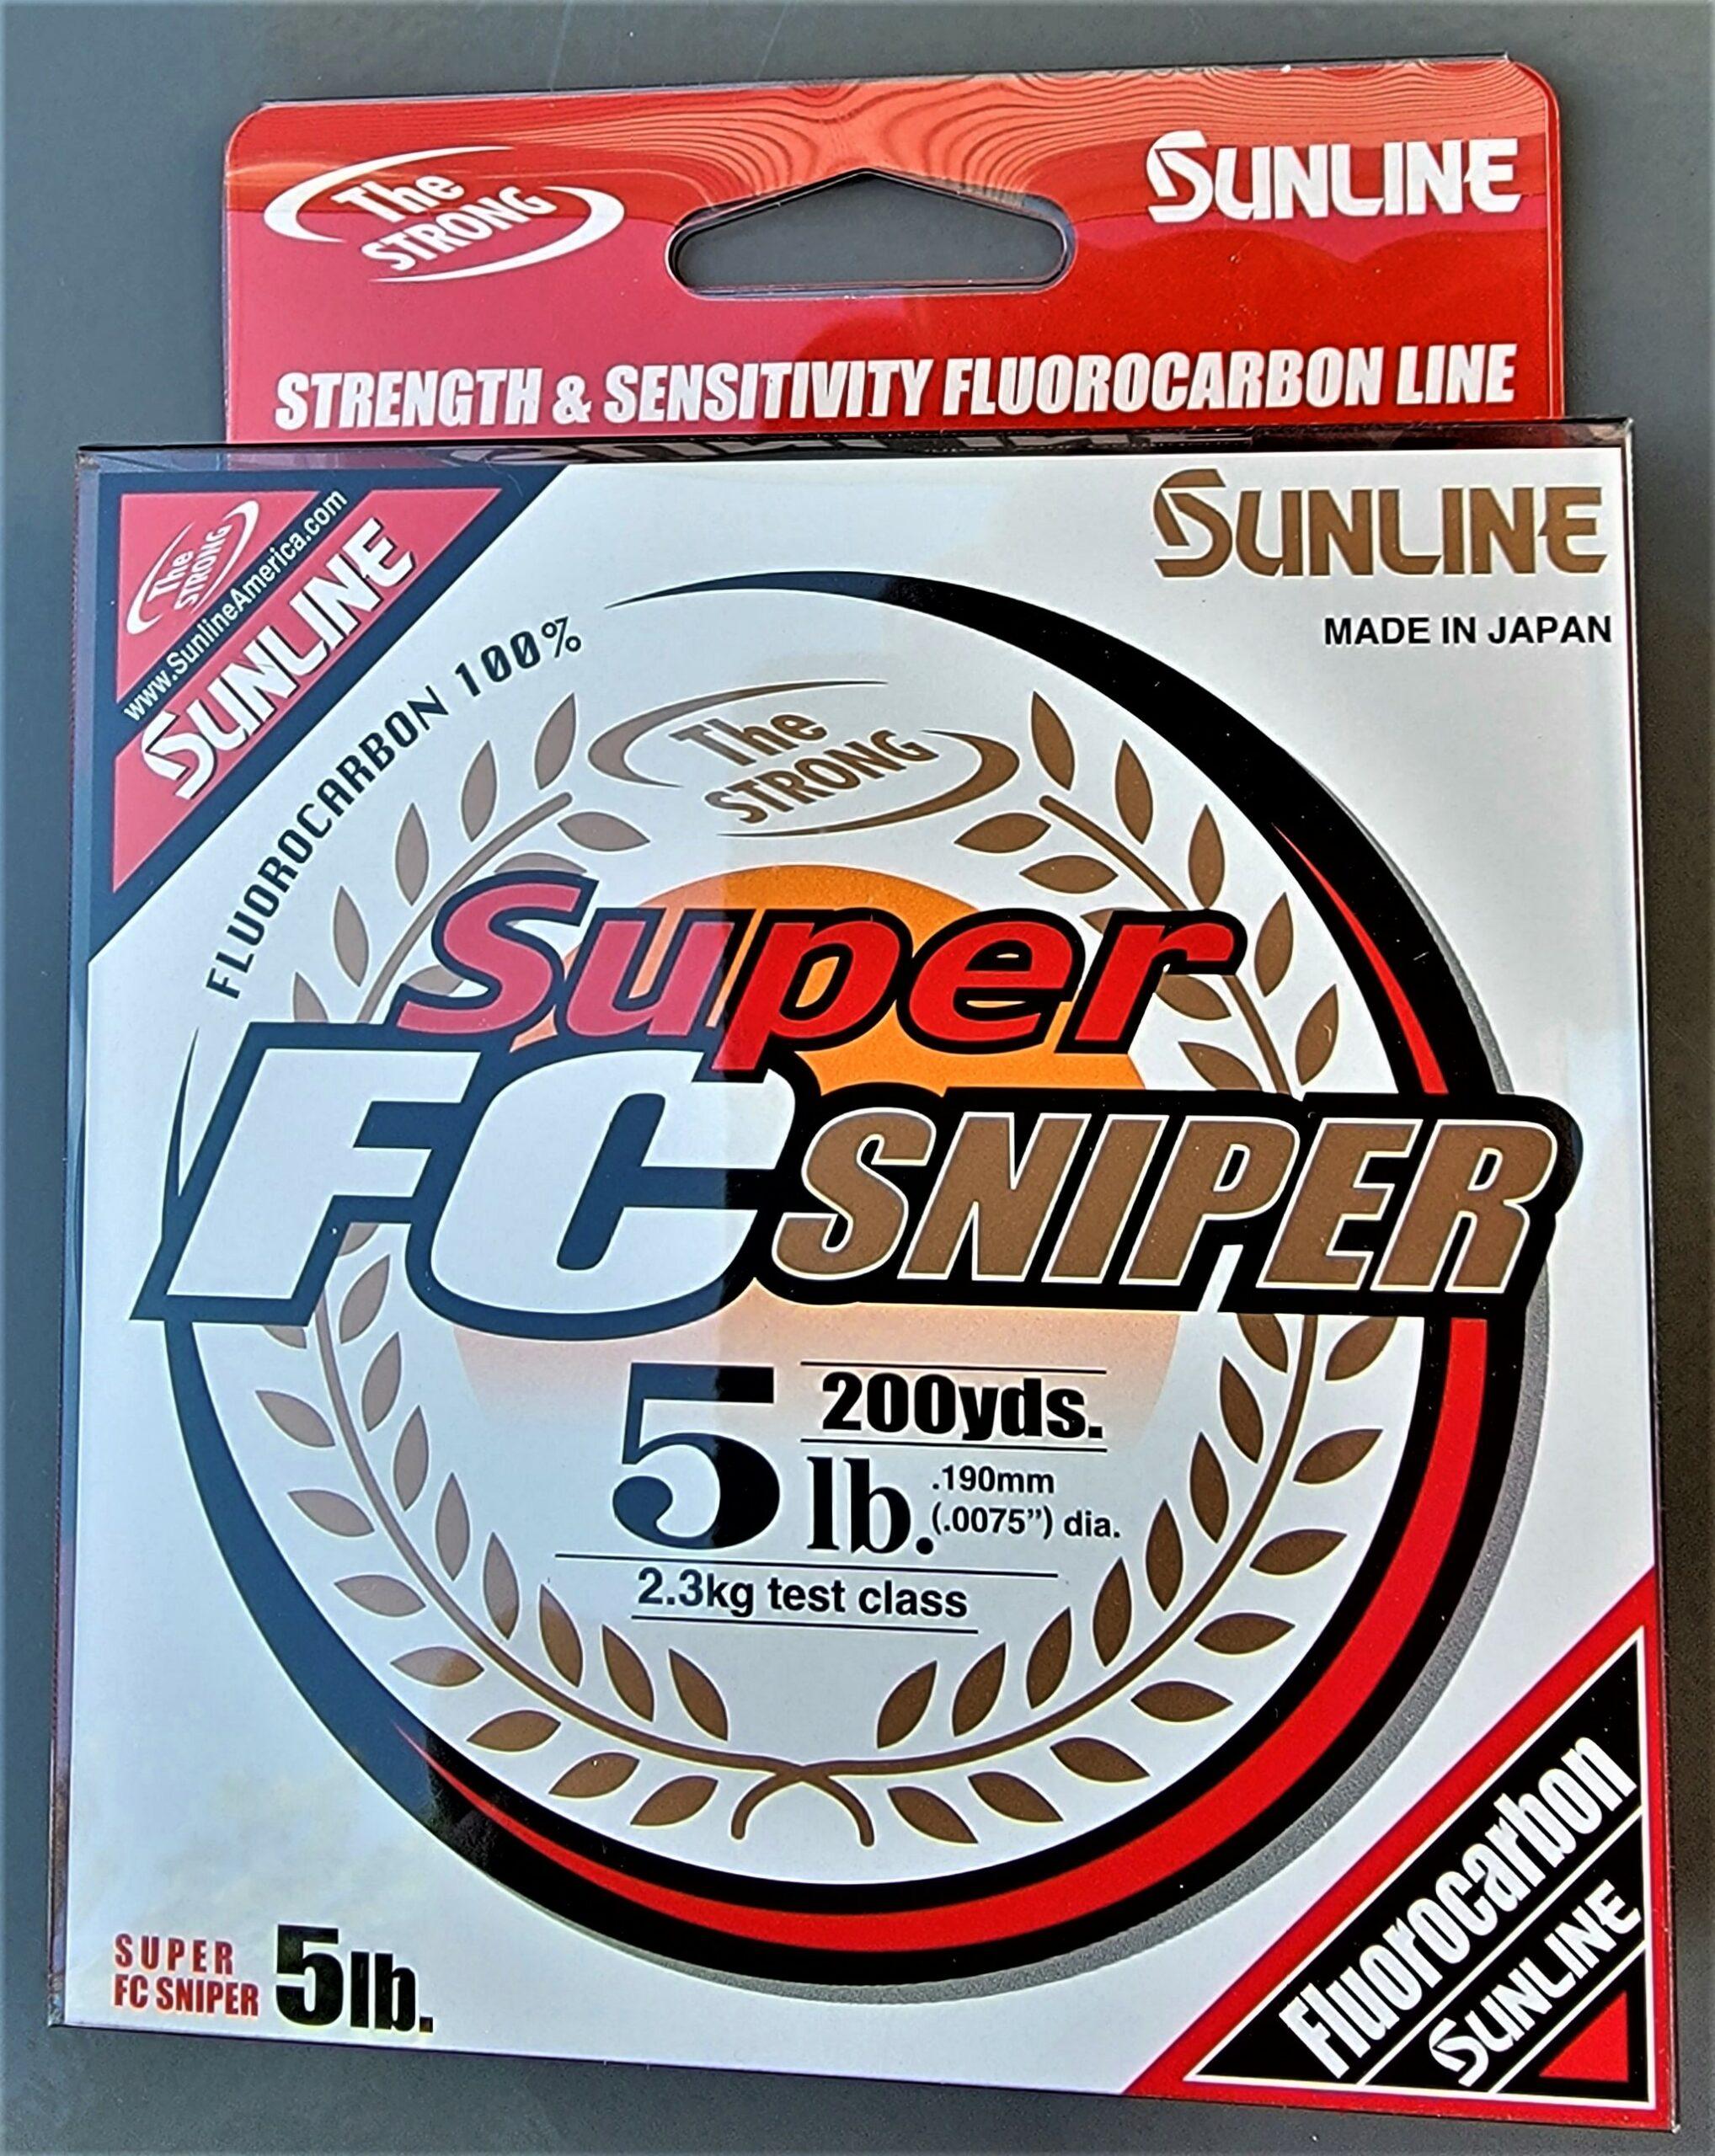 Sunline - Super FC Sniper - 200 YD - Super FC Sniper - 5 LB - Natural Clear